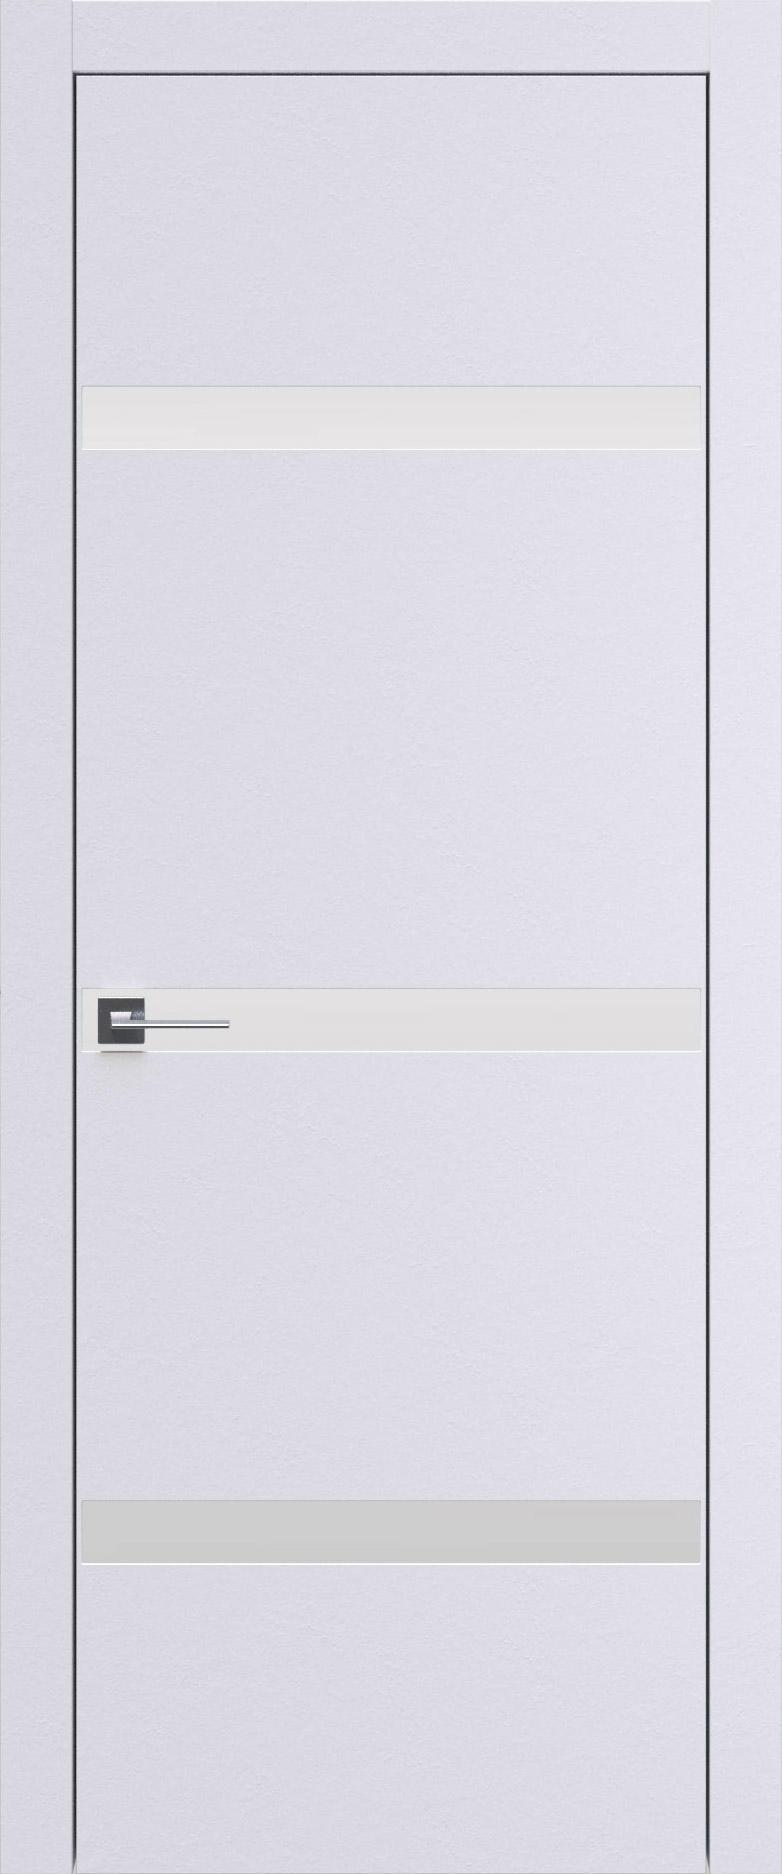 Tivoli Г-4 цвет - Арктик белый Без стекла (ДГ)